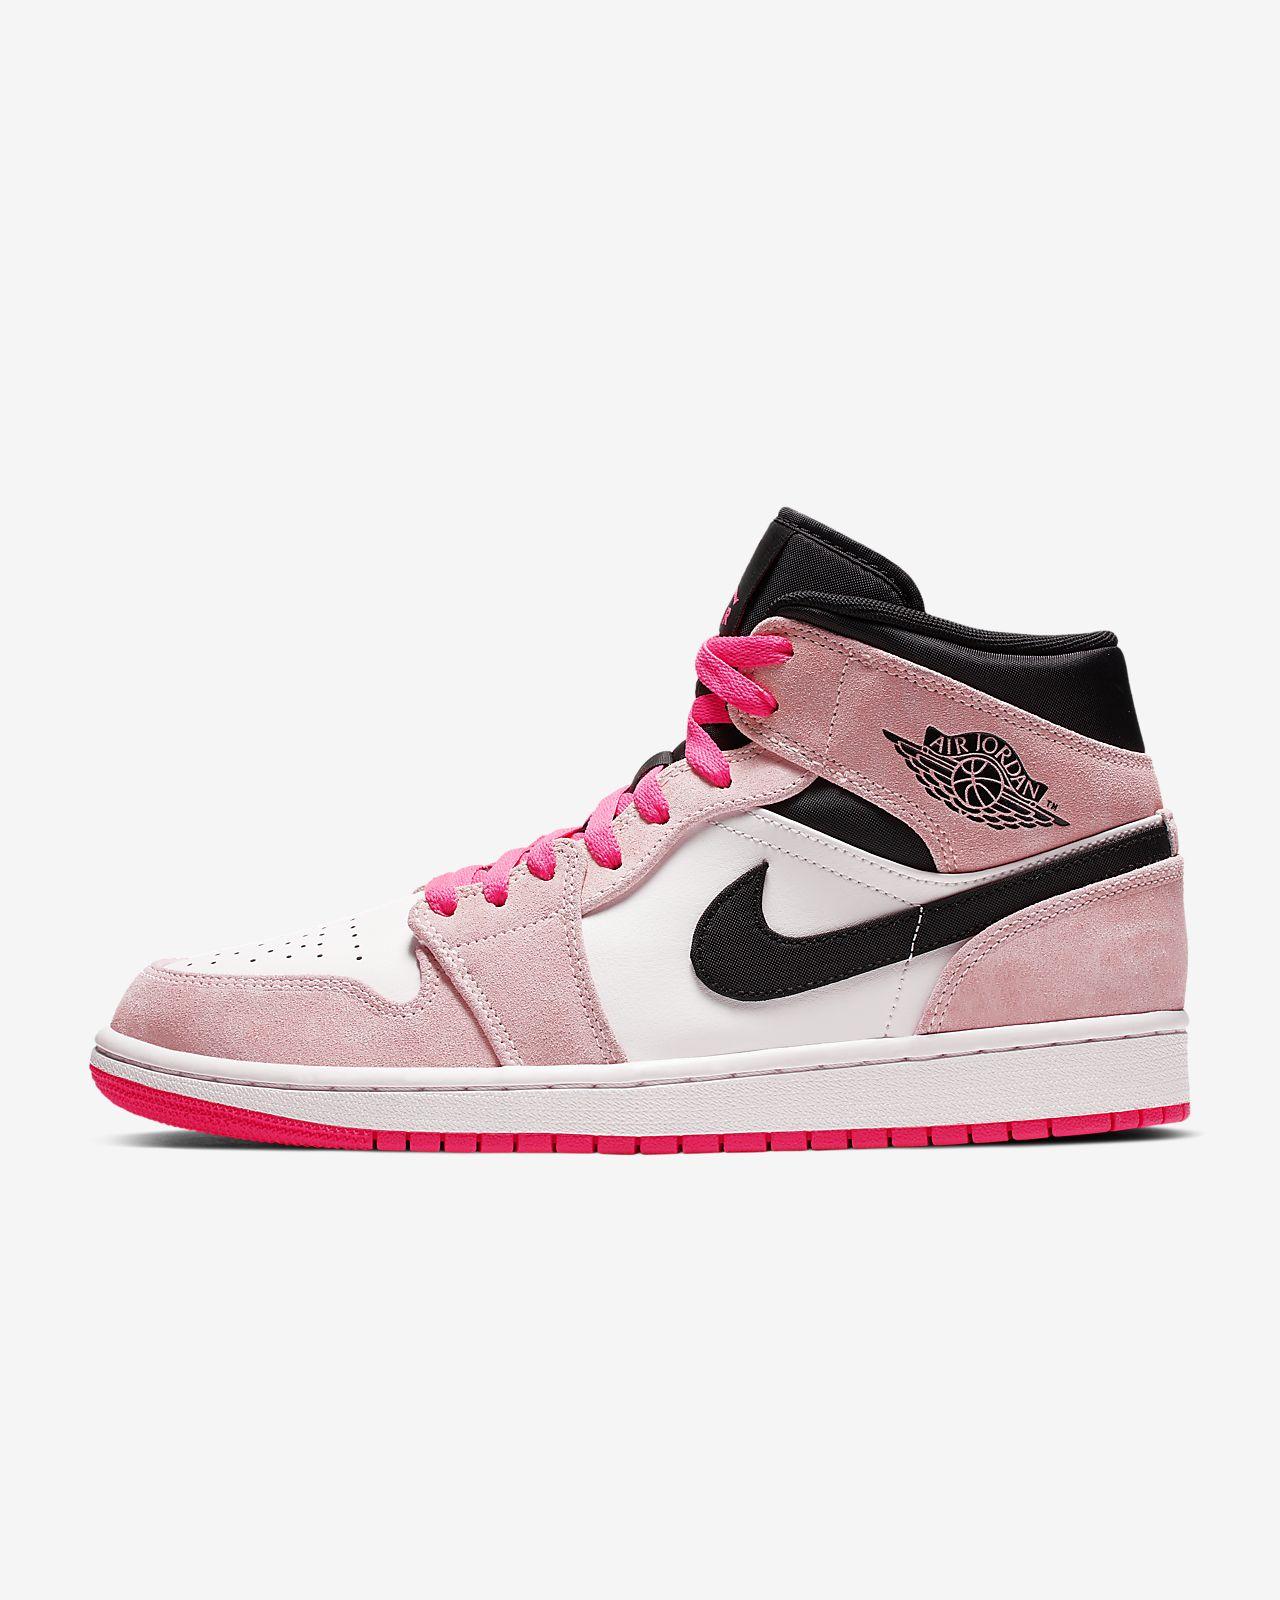 ef1c23f57ff Calzado para hombre Air Jordan 1 Mid SE. Nike.com CL